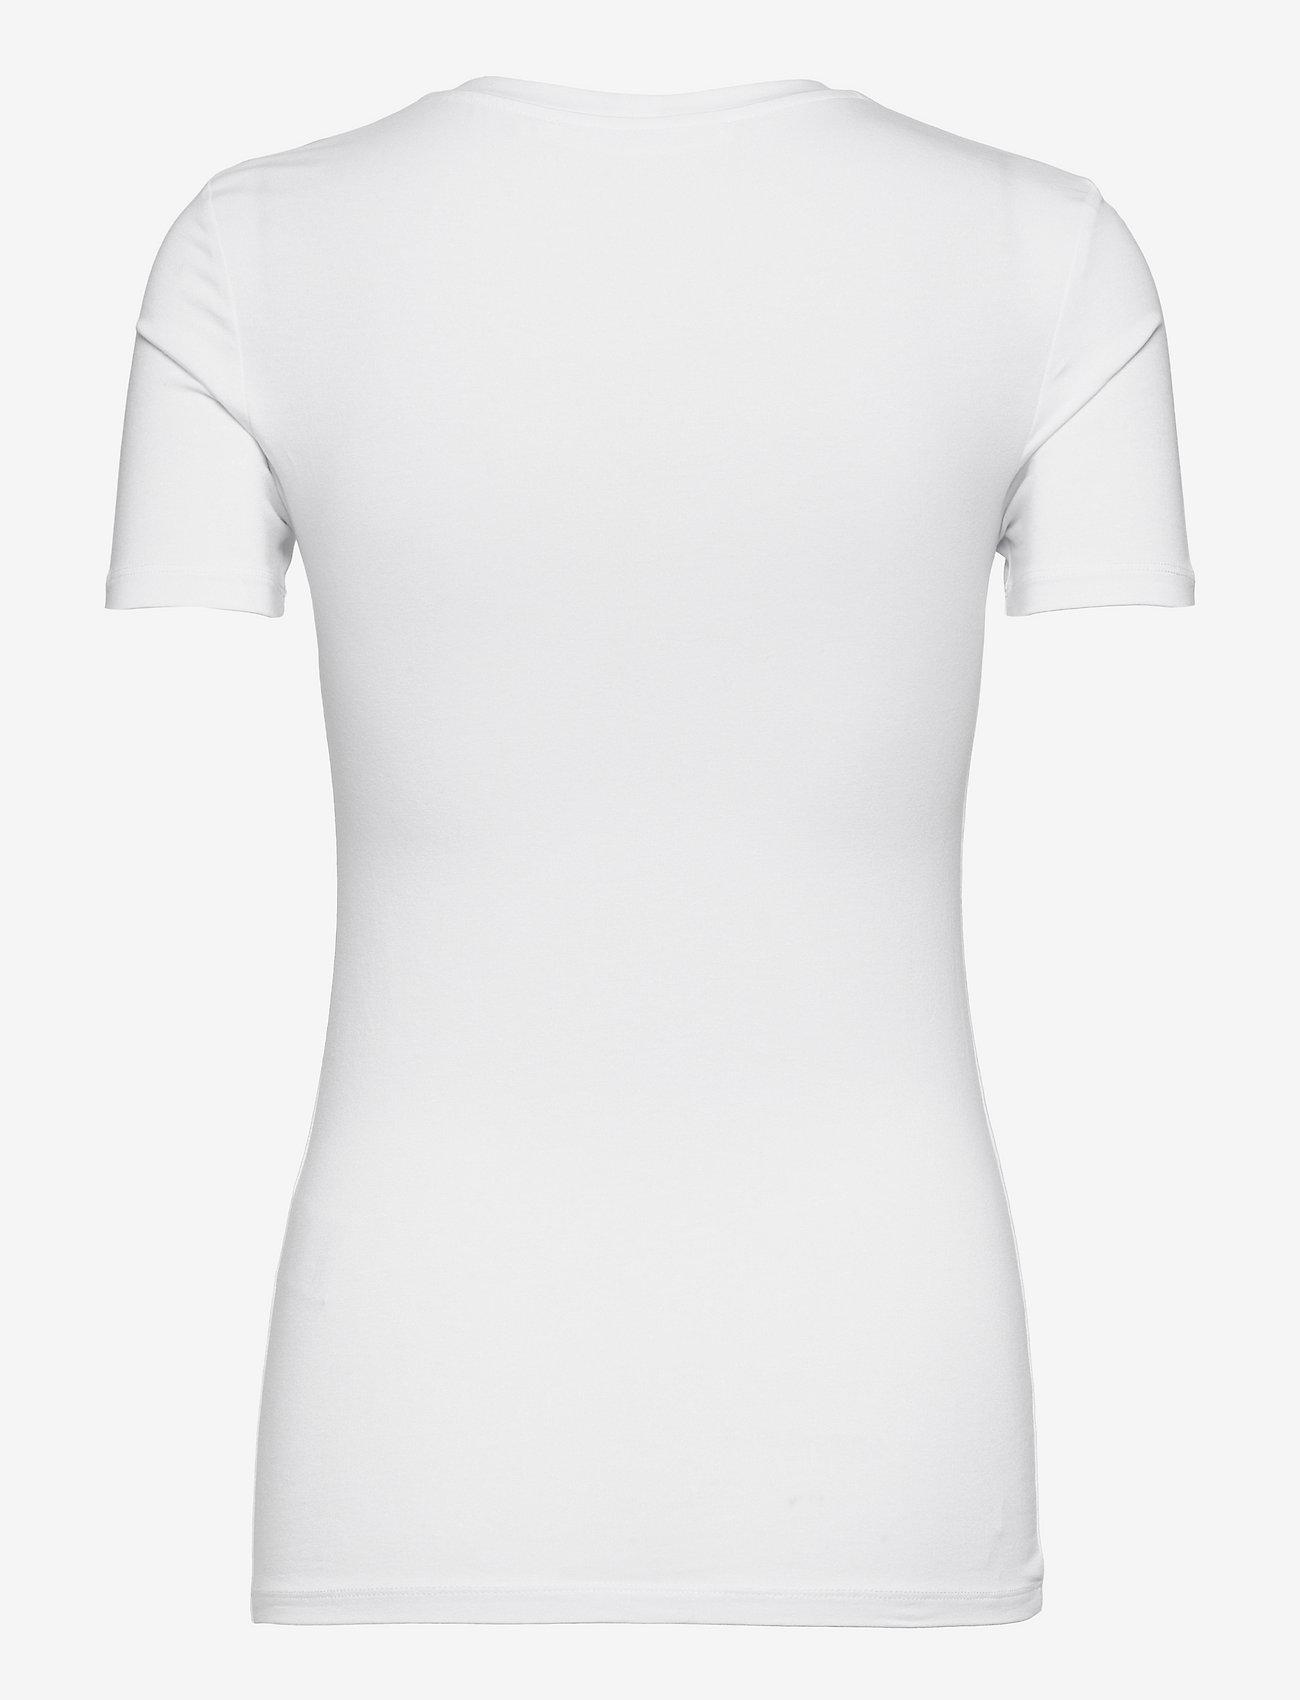 Samsøe Samsøe - Ester ss 265 - t-shirts - white - 1